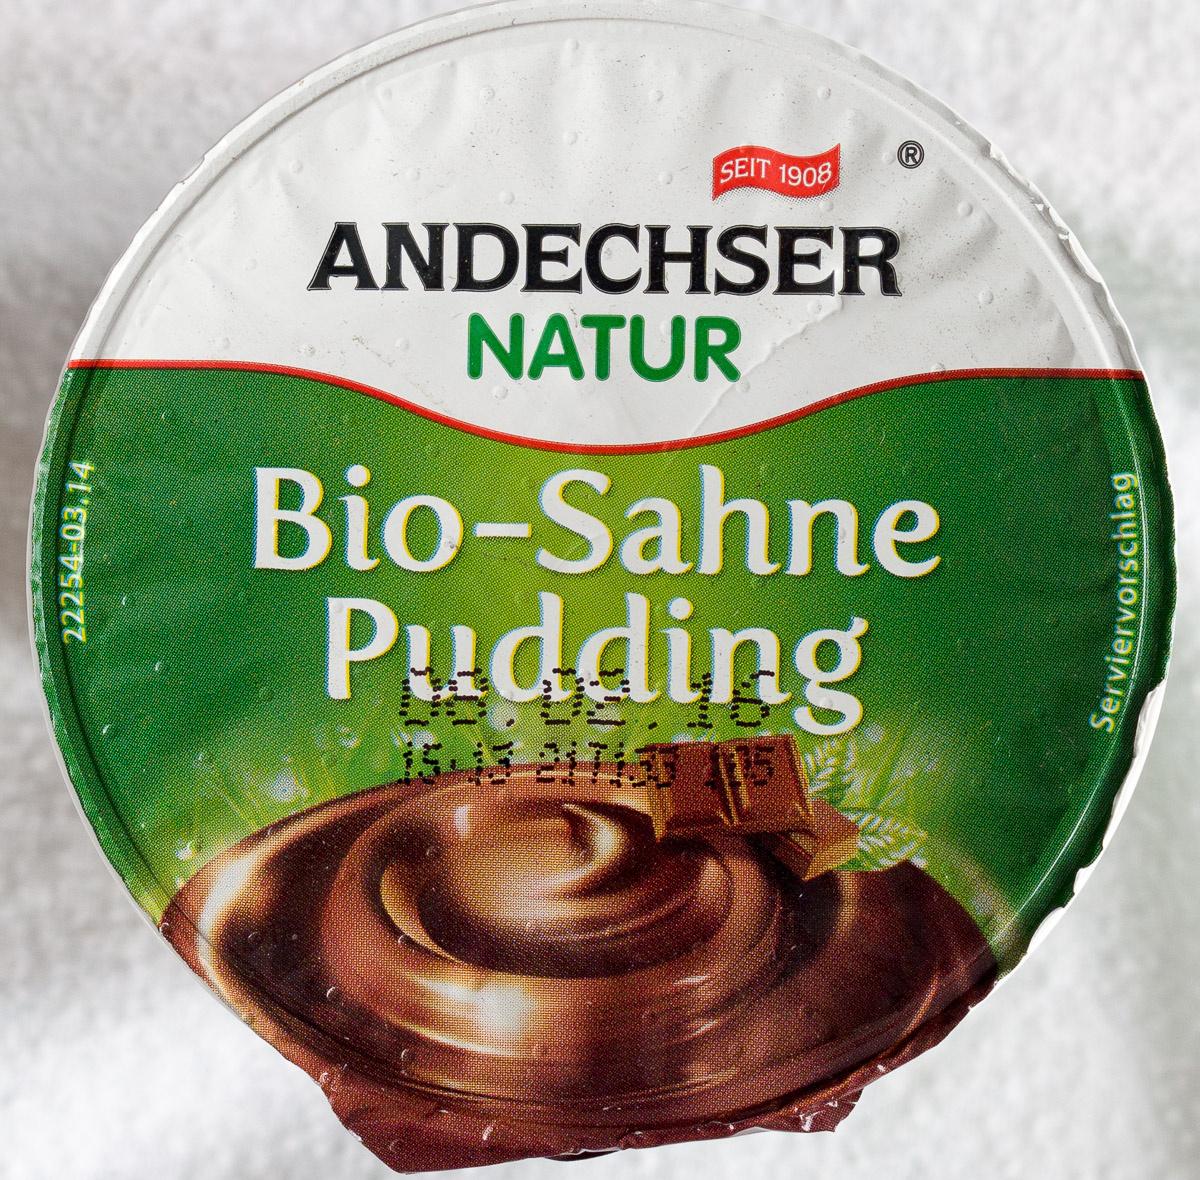 Bio-Sahne Pudding Schokolade - Product